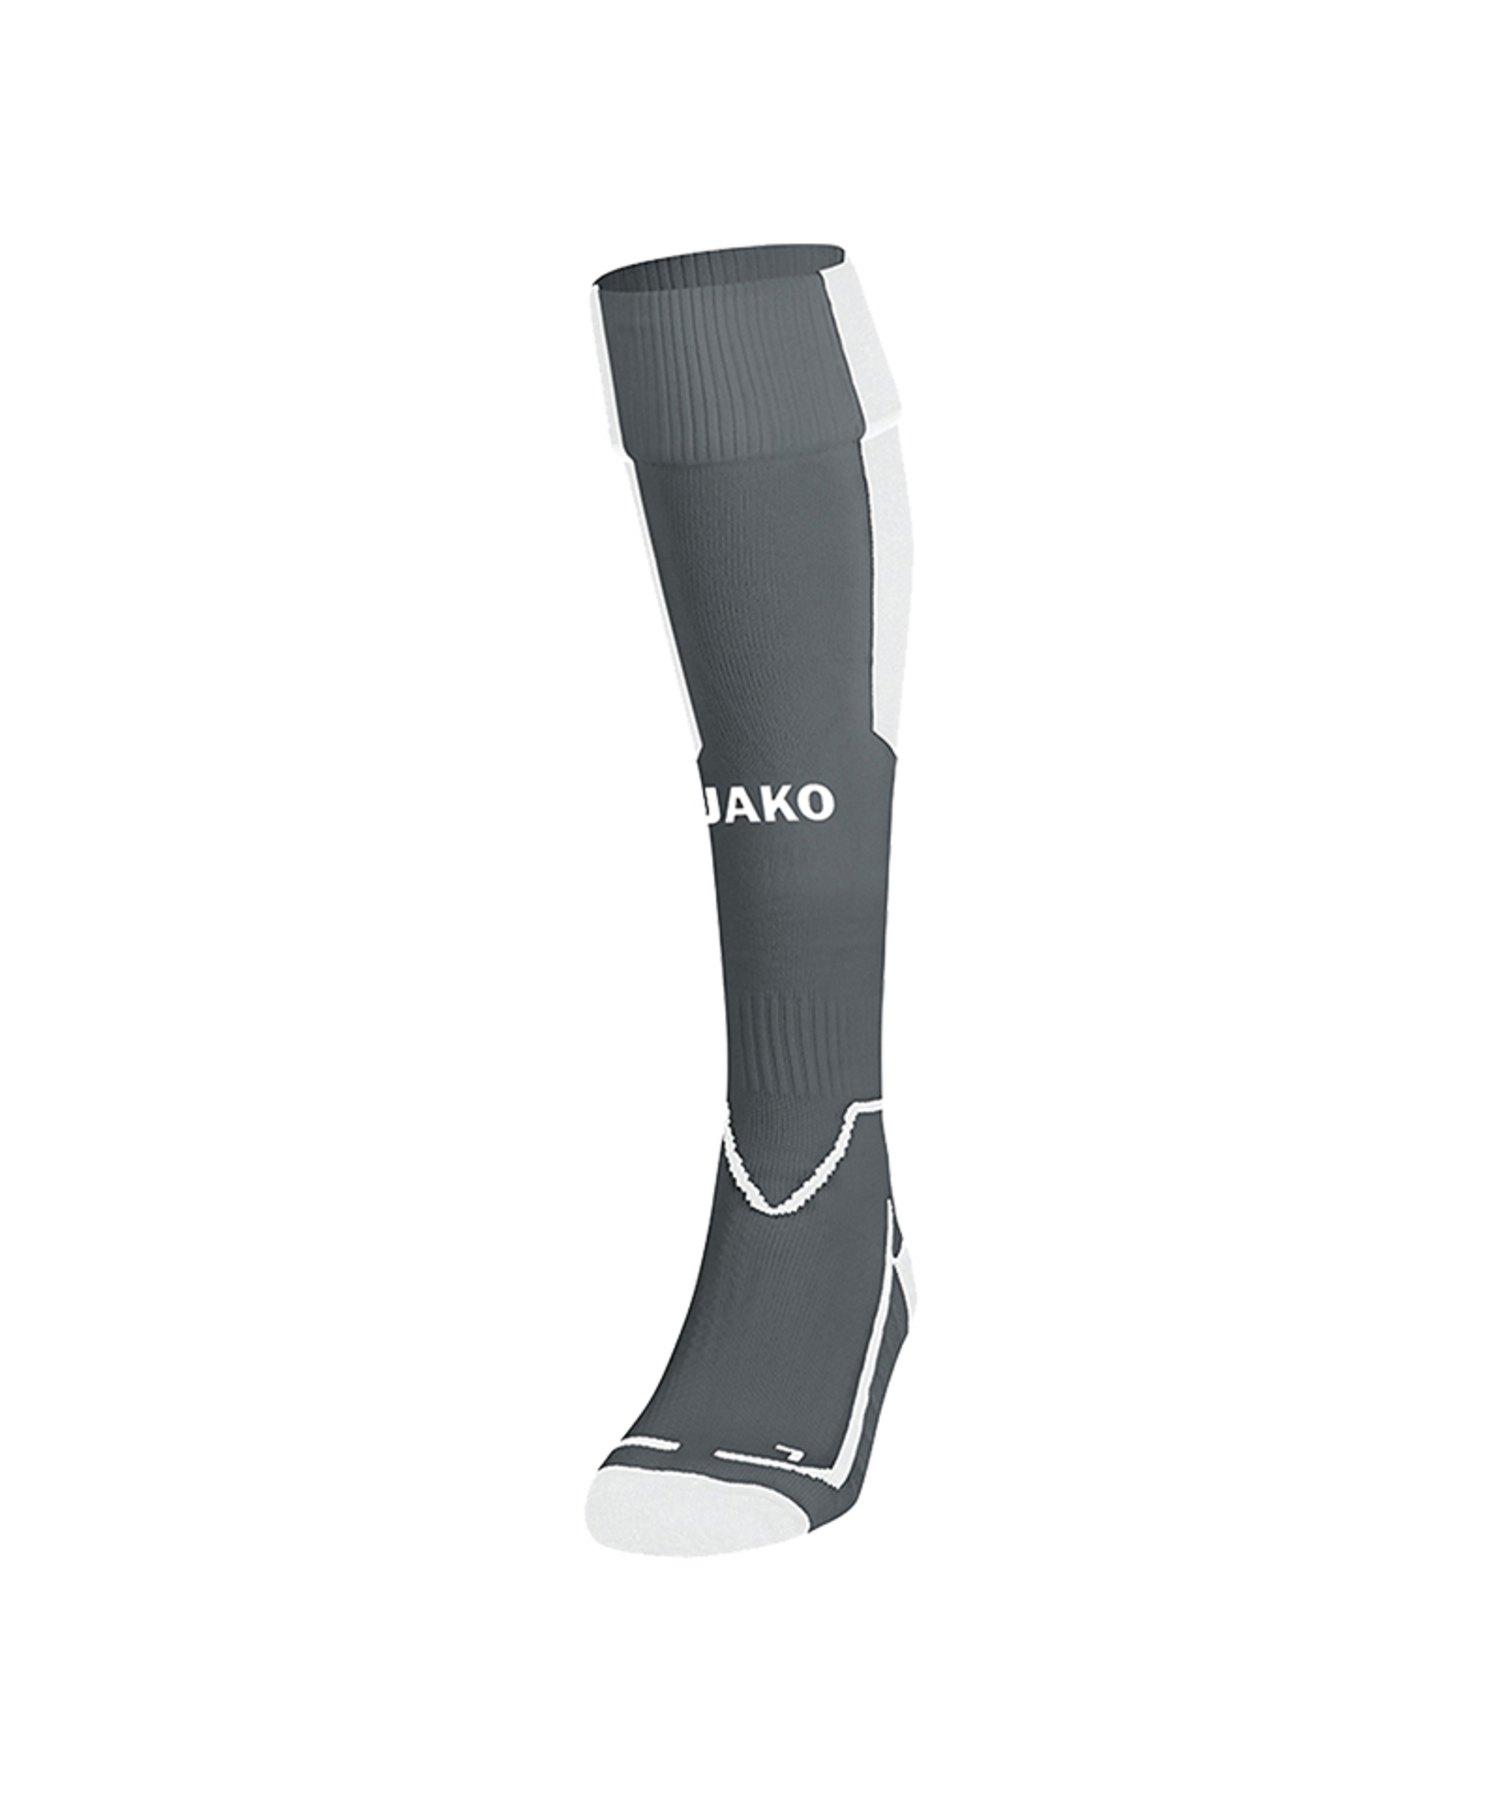 Jako Lazio Stutzenstrumpf Grau Weiss F41 - Grau